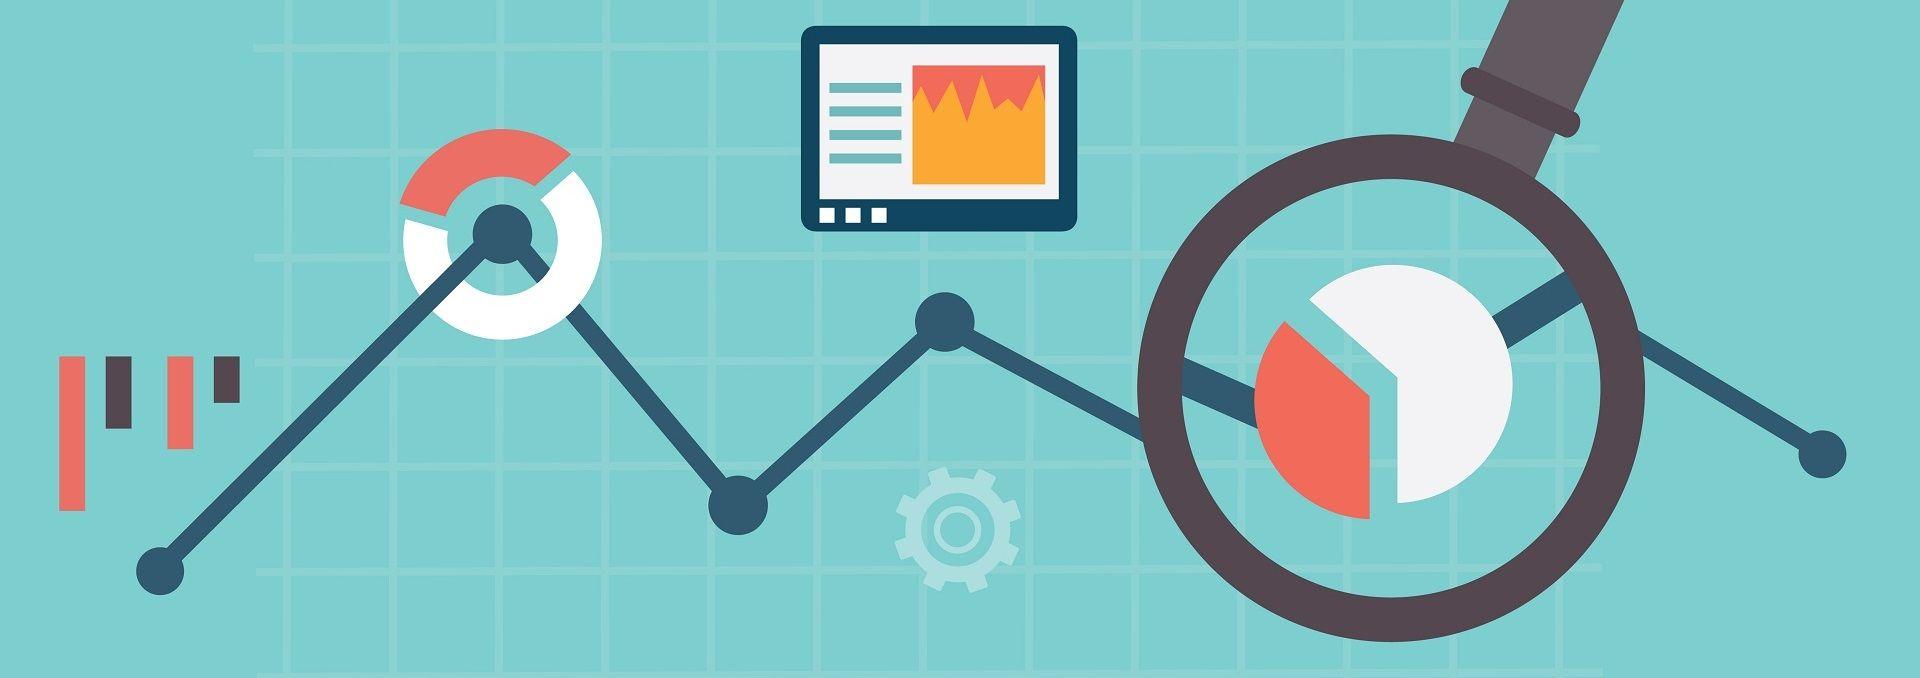 beyond-analytics-optimizing-HR-data-perseus